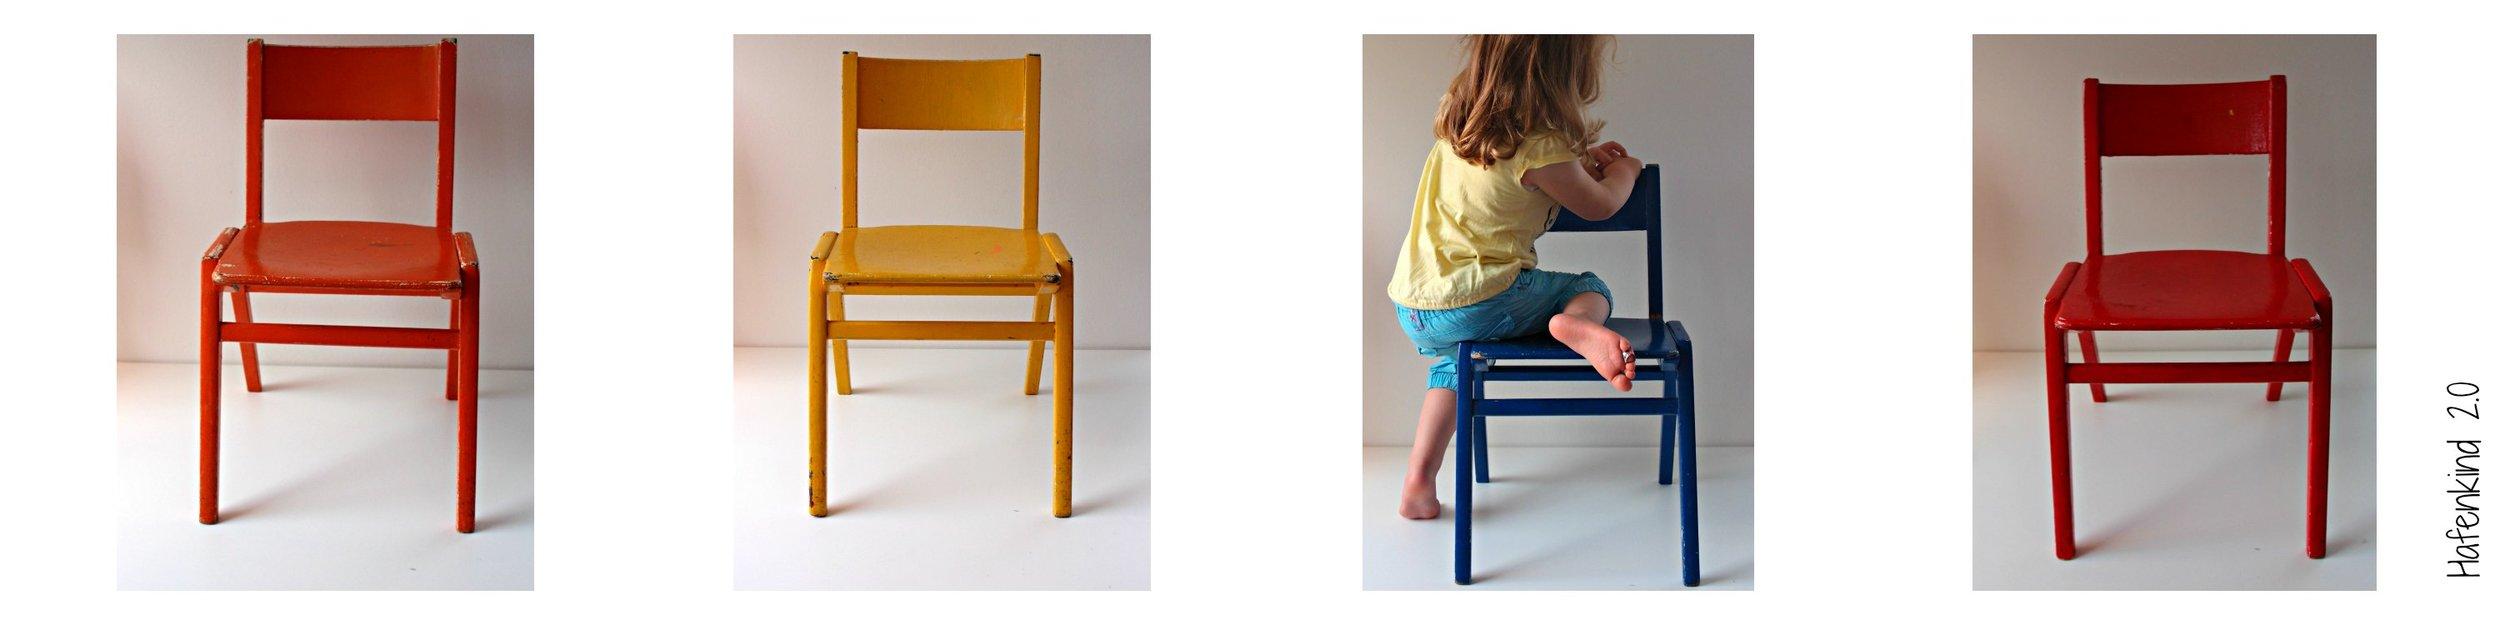 Stuhlreihe.jpg